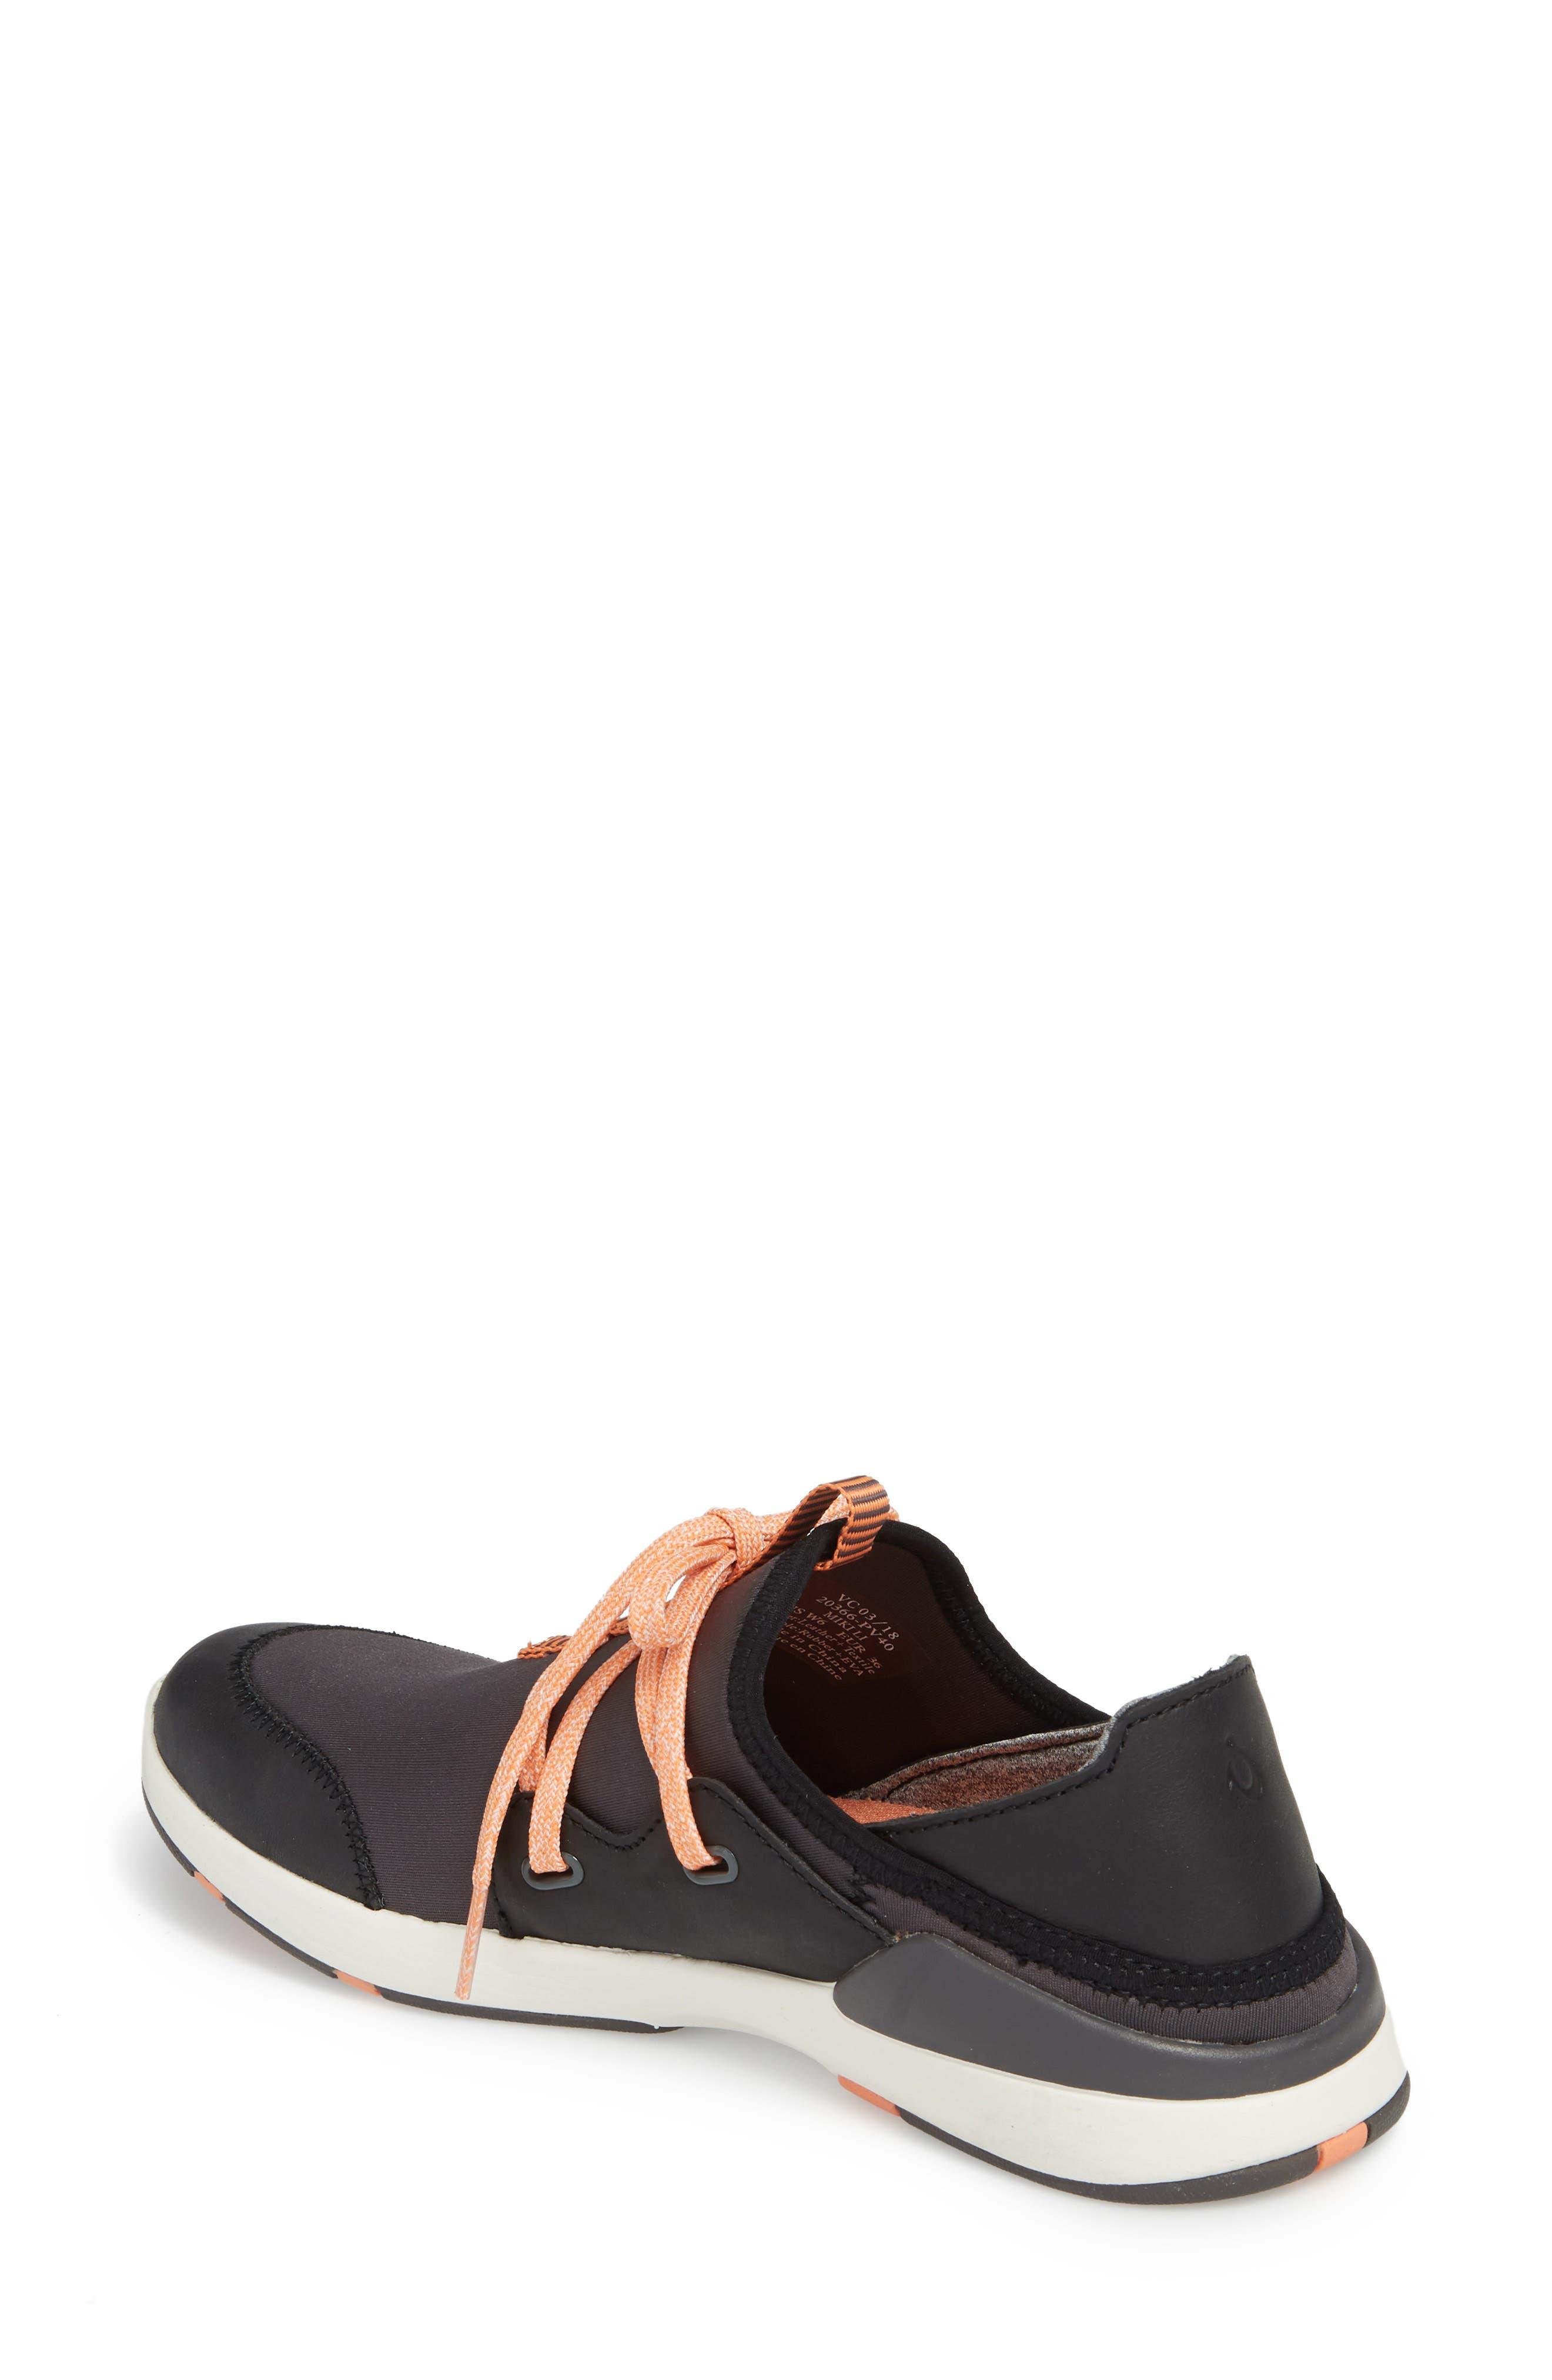 Miki Li Convertible Sneaker,                             Alternate thumbnail 2, color,                             PAVEMENT/ BLACK FABRIC